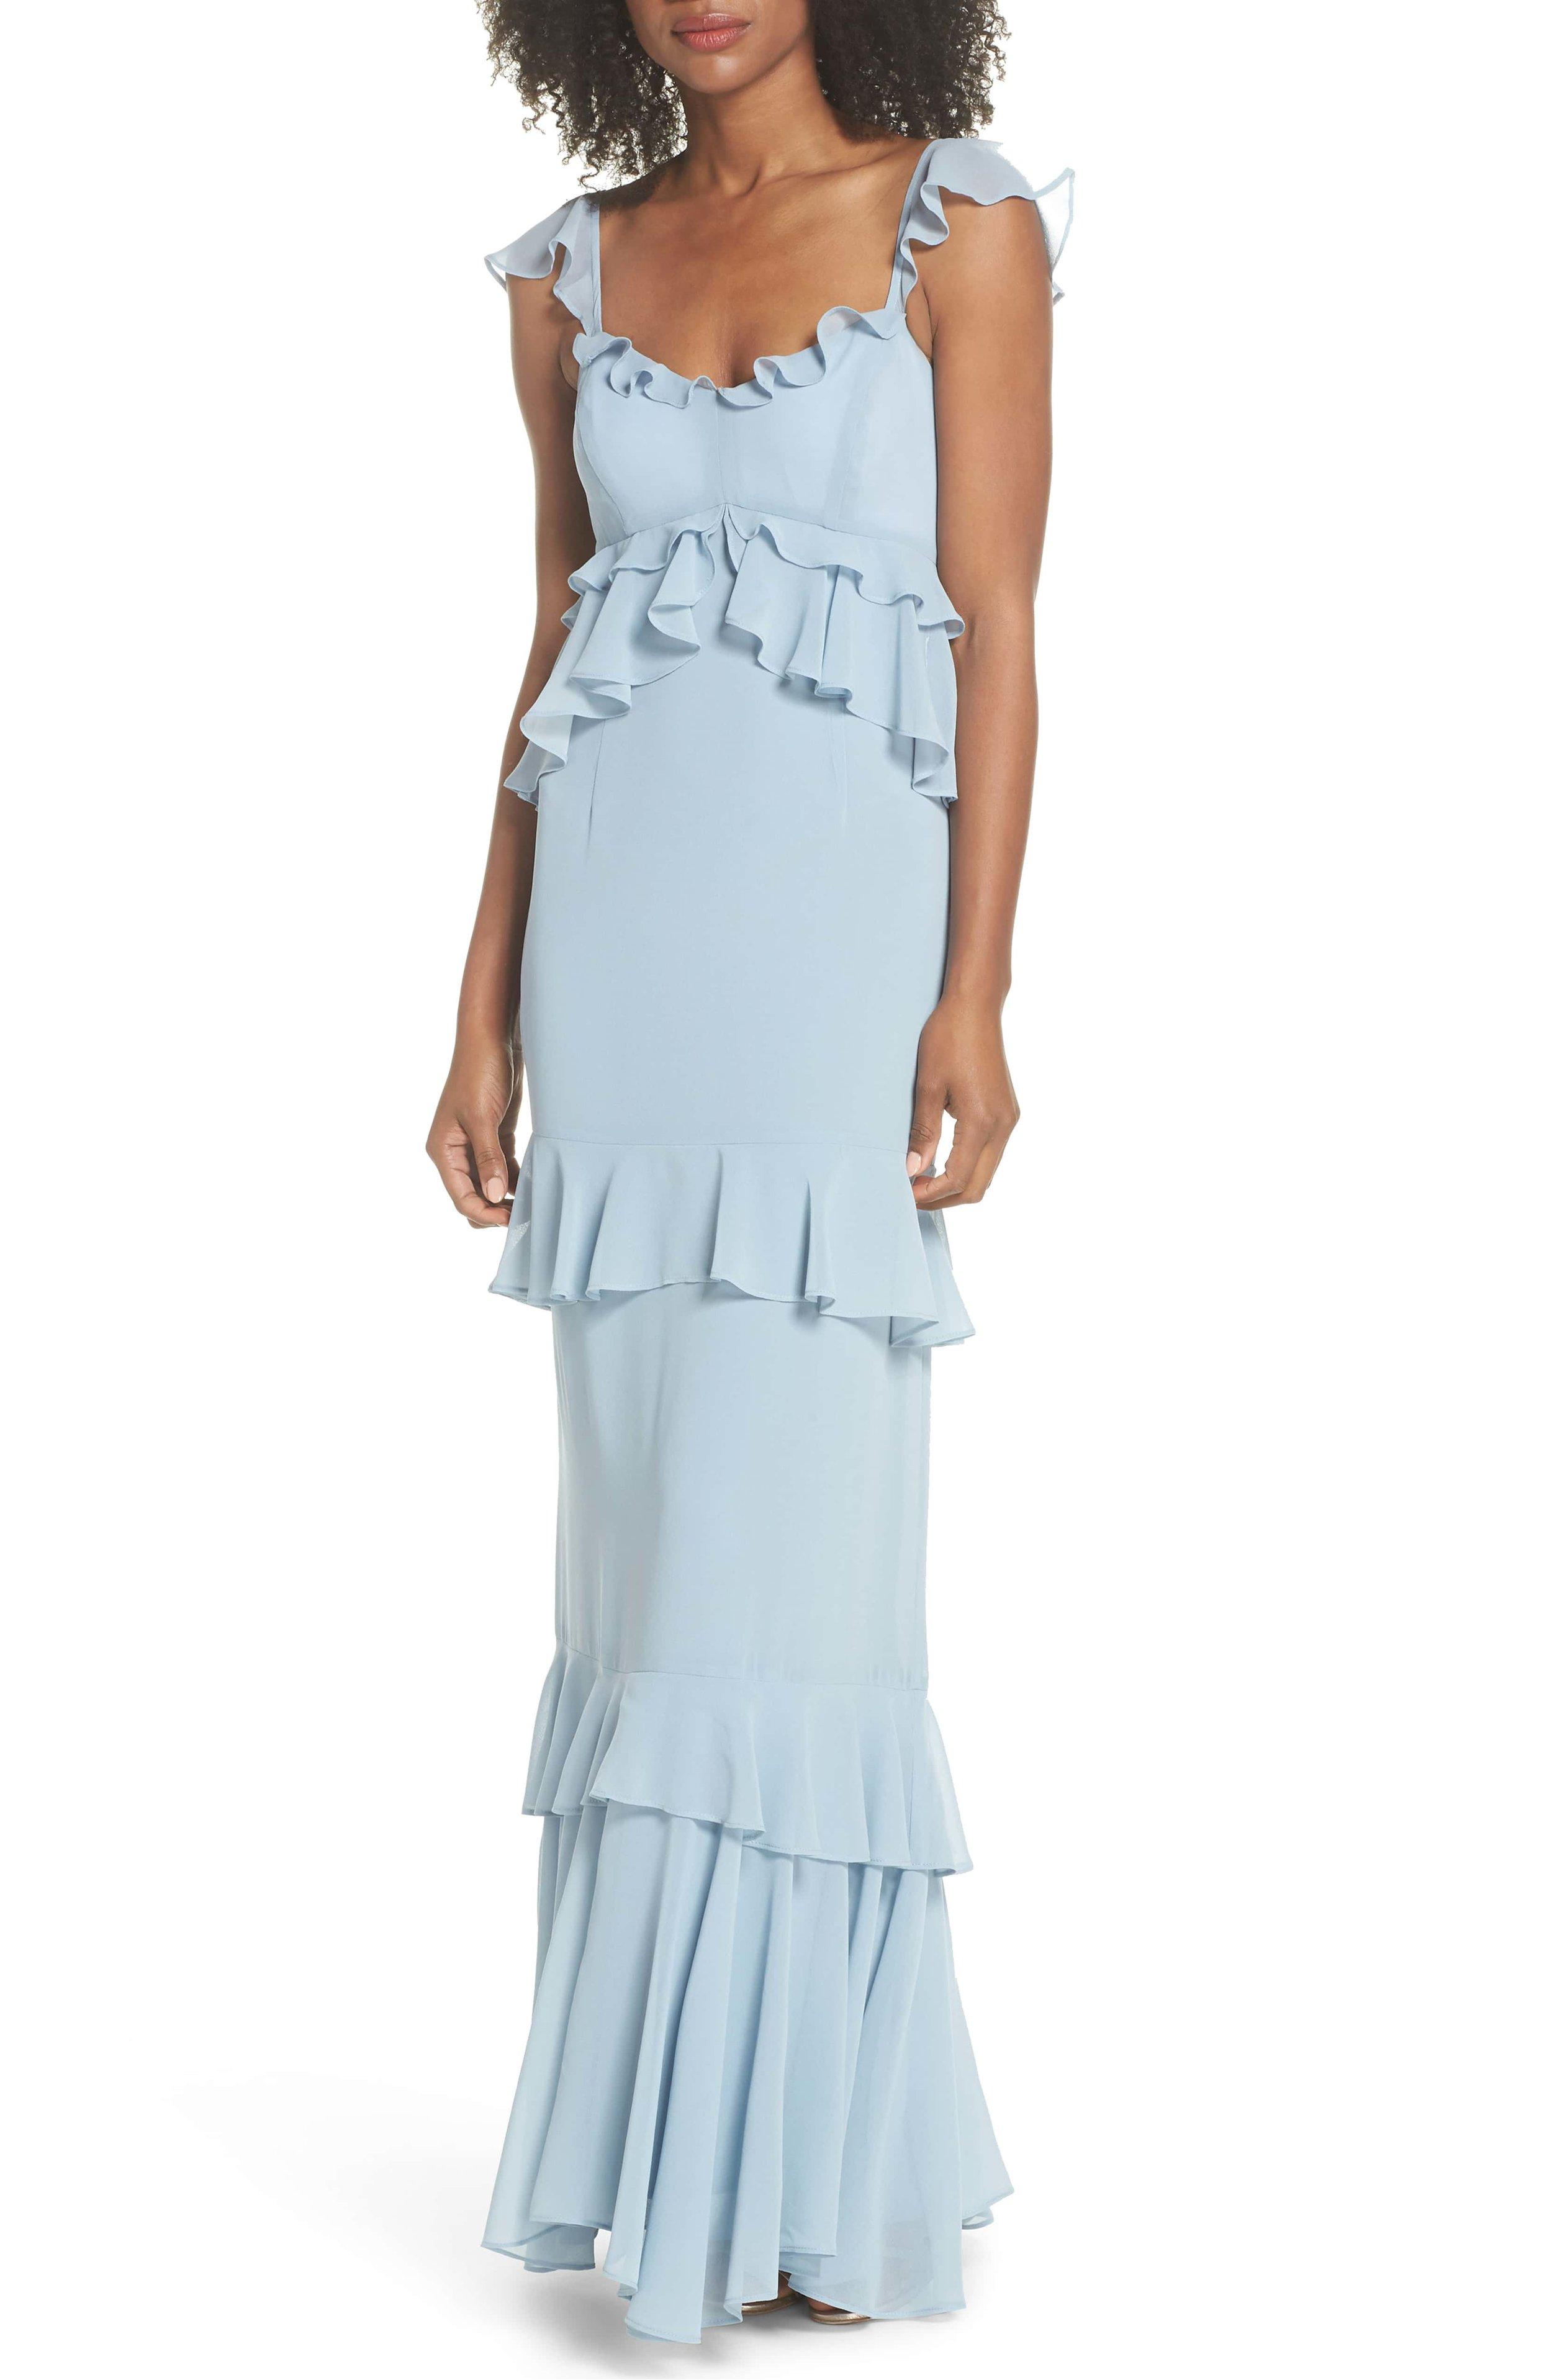 Gywneth bridesmaid dress.jpeg